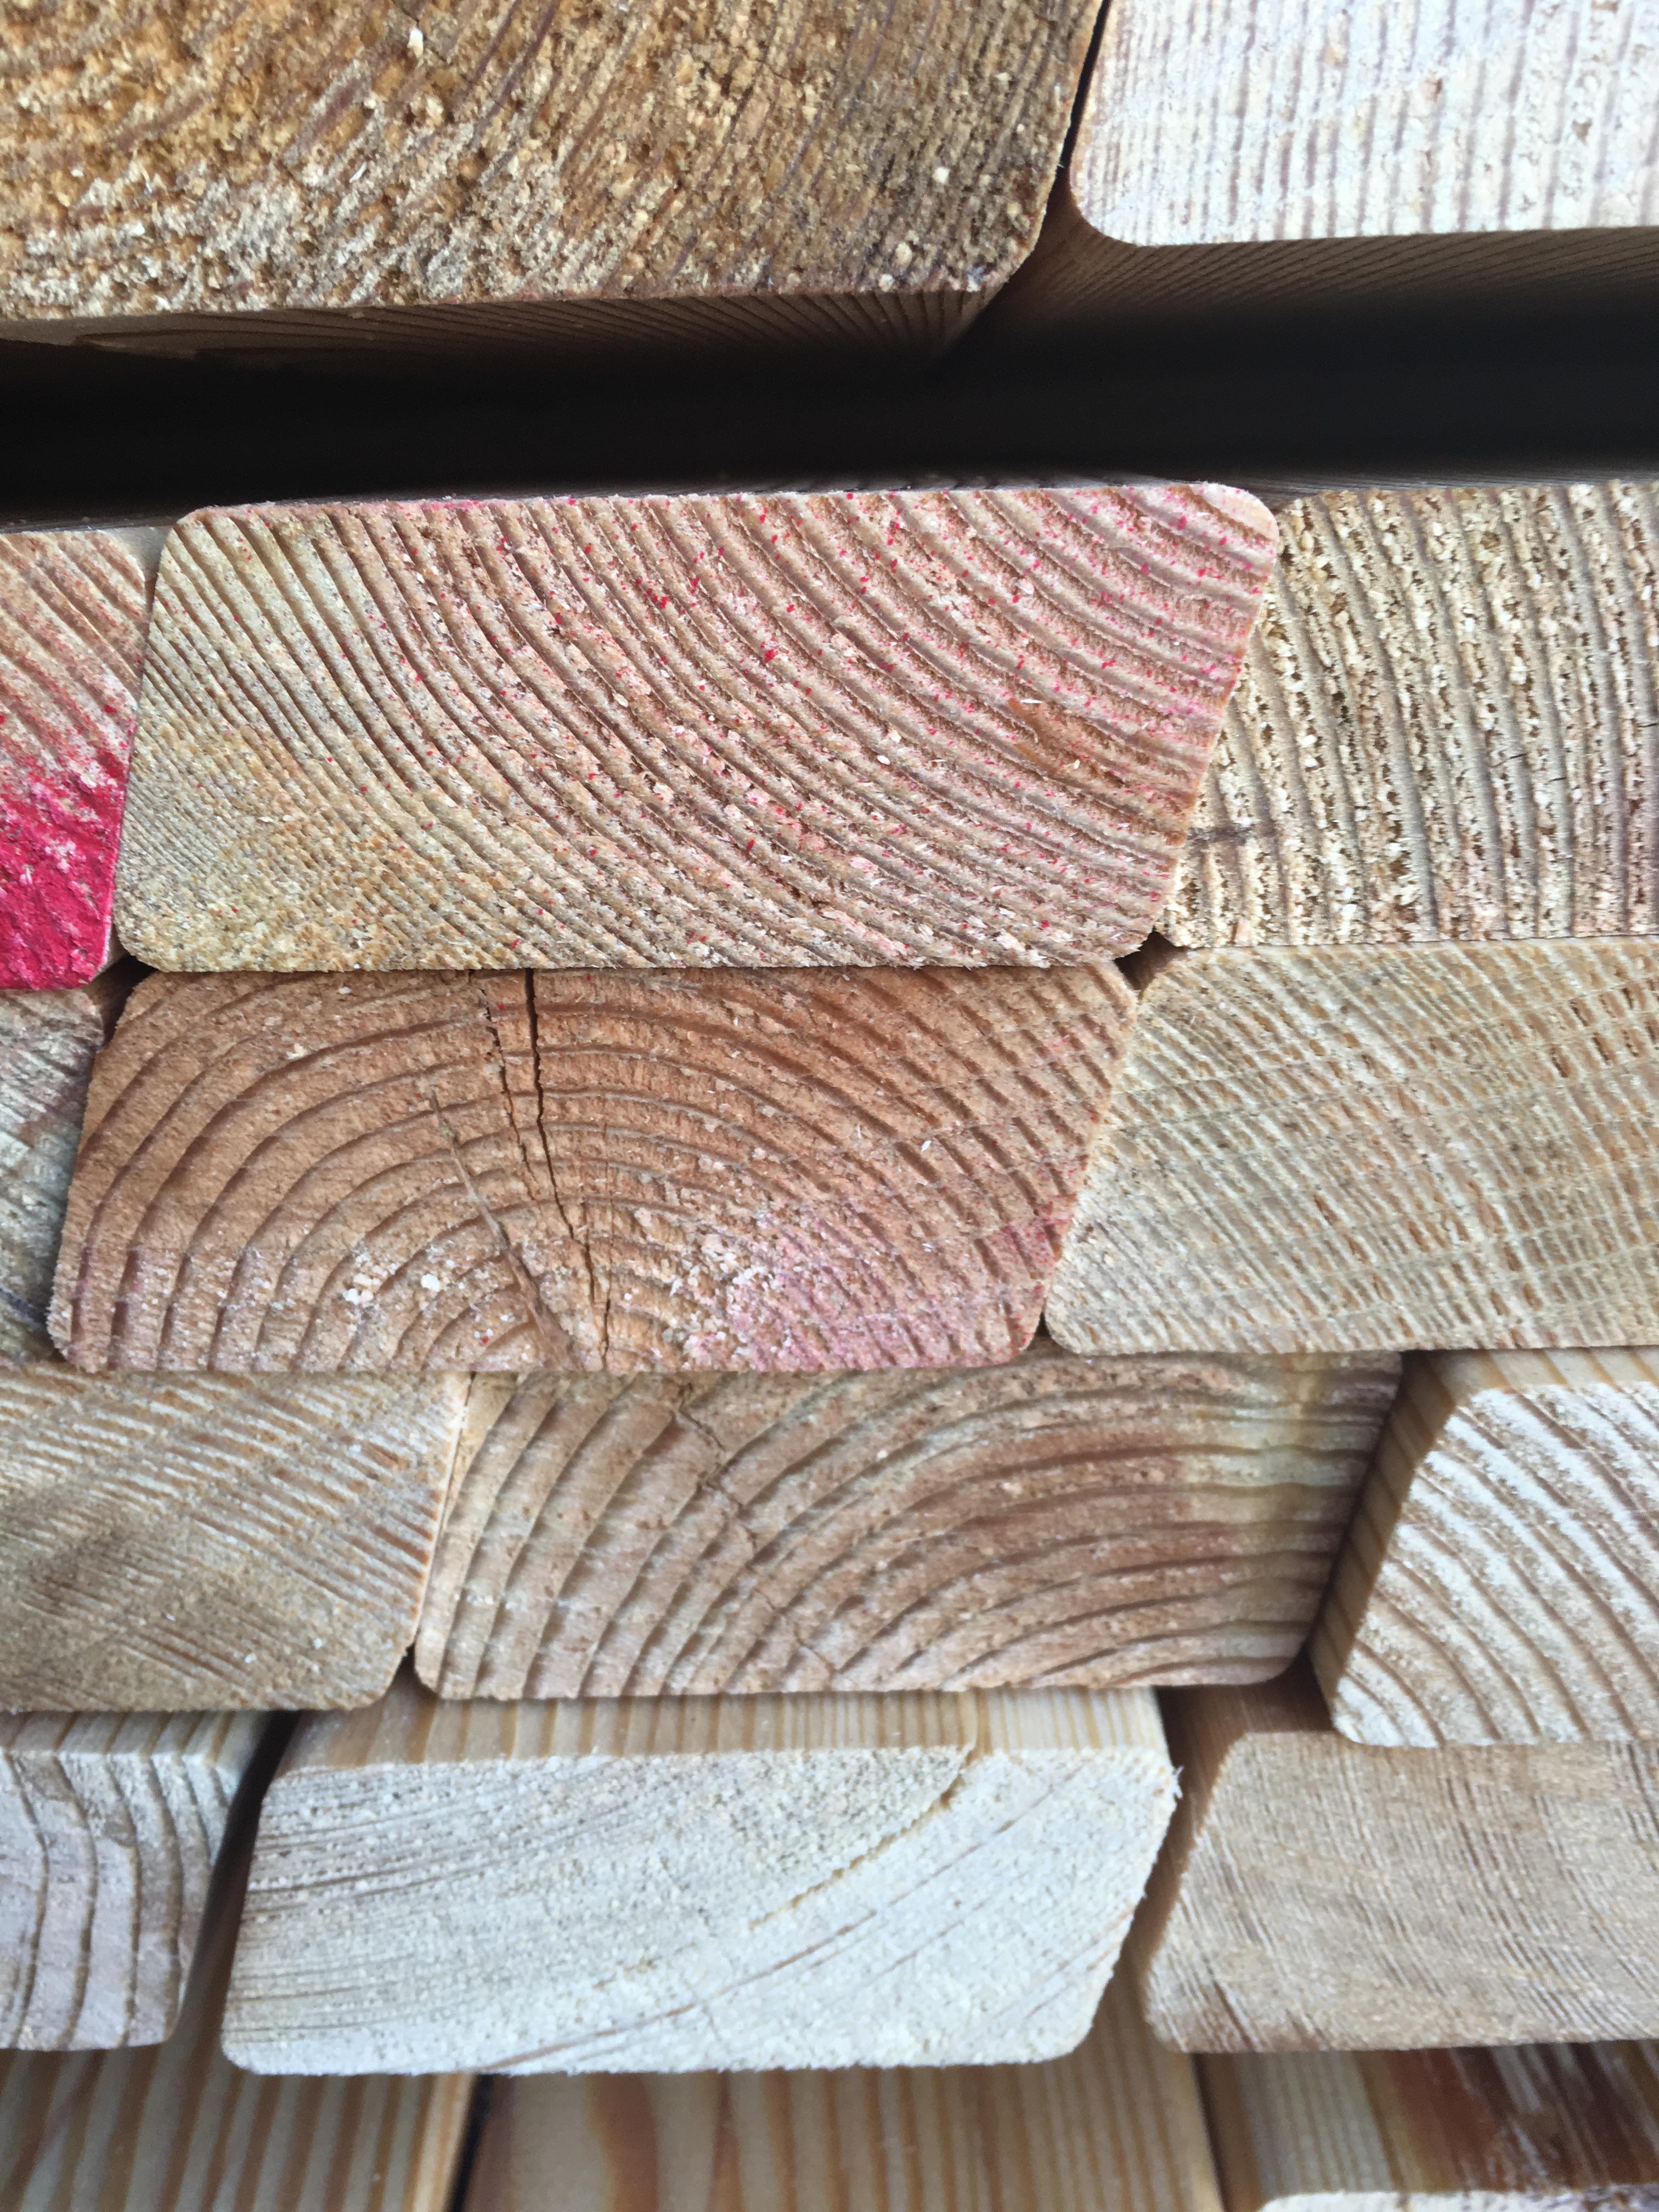 Rhombusleisten 27 x 68 mm Fassadenverkleidung Holzhandel24